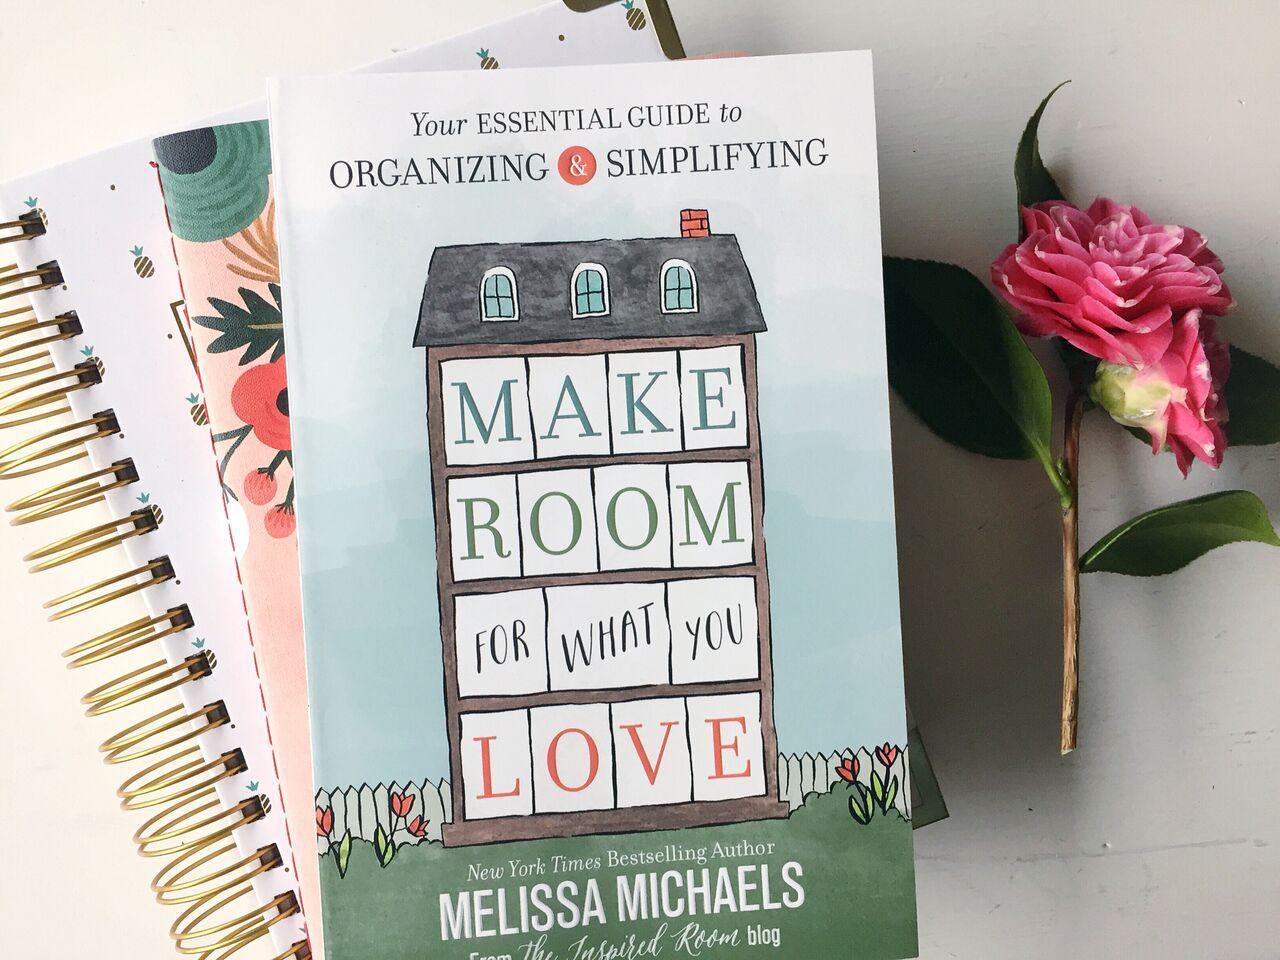 melissa's book